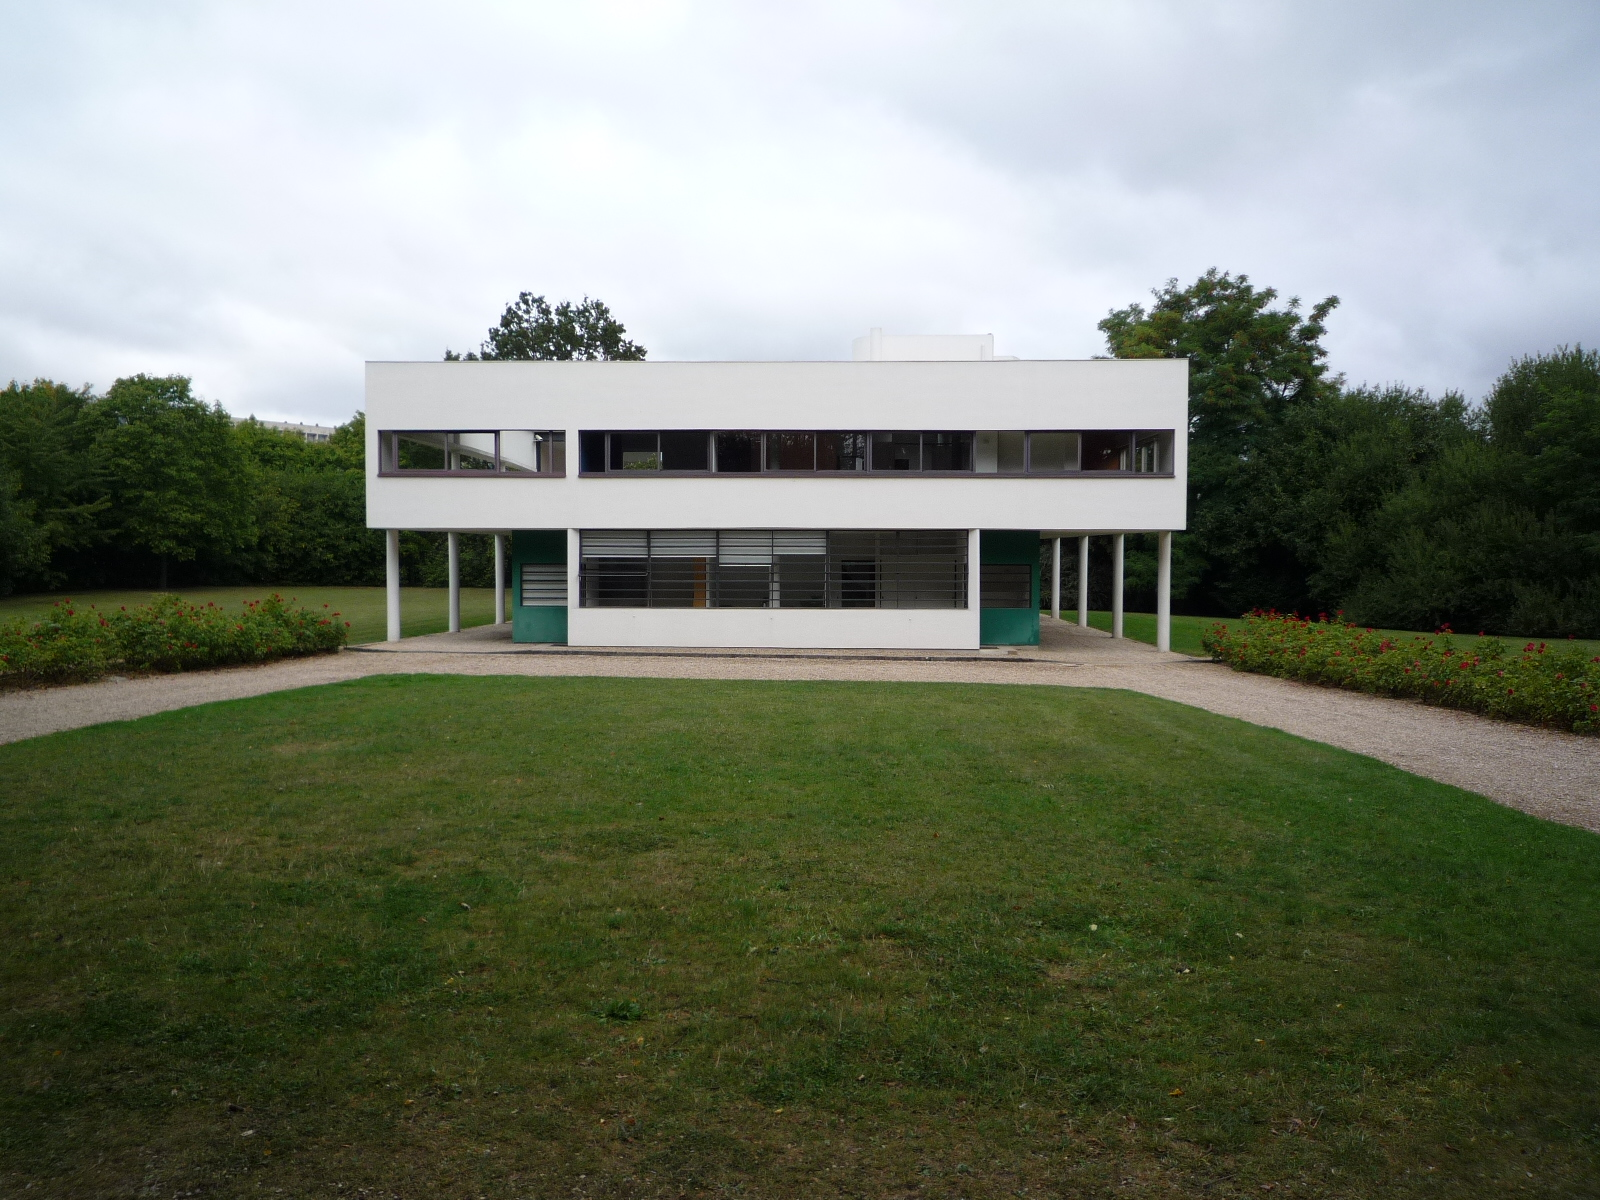 villa savoye le corbusier urban architecture now. Black Bedroom Furniture Sets. Home Design Ideas